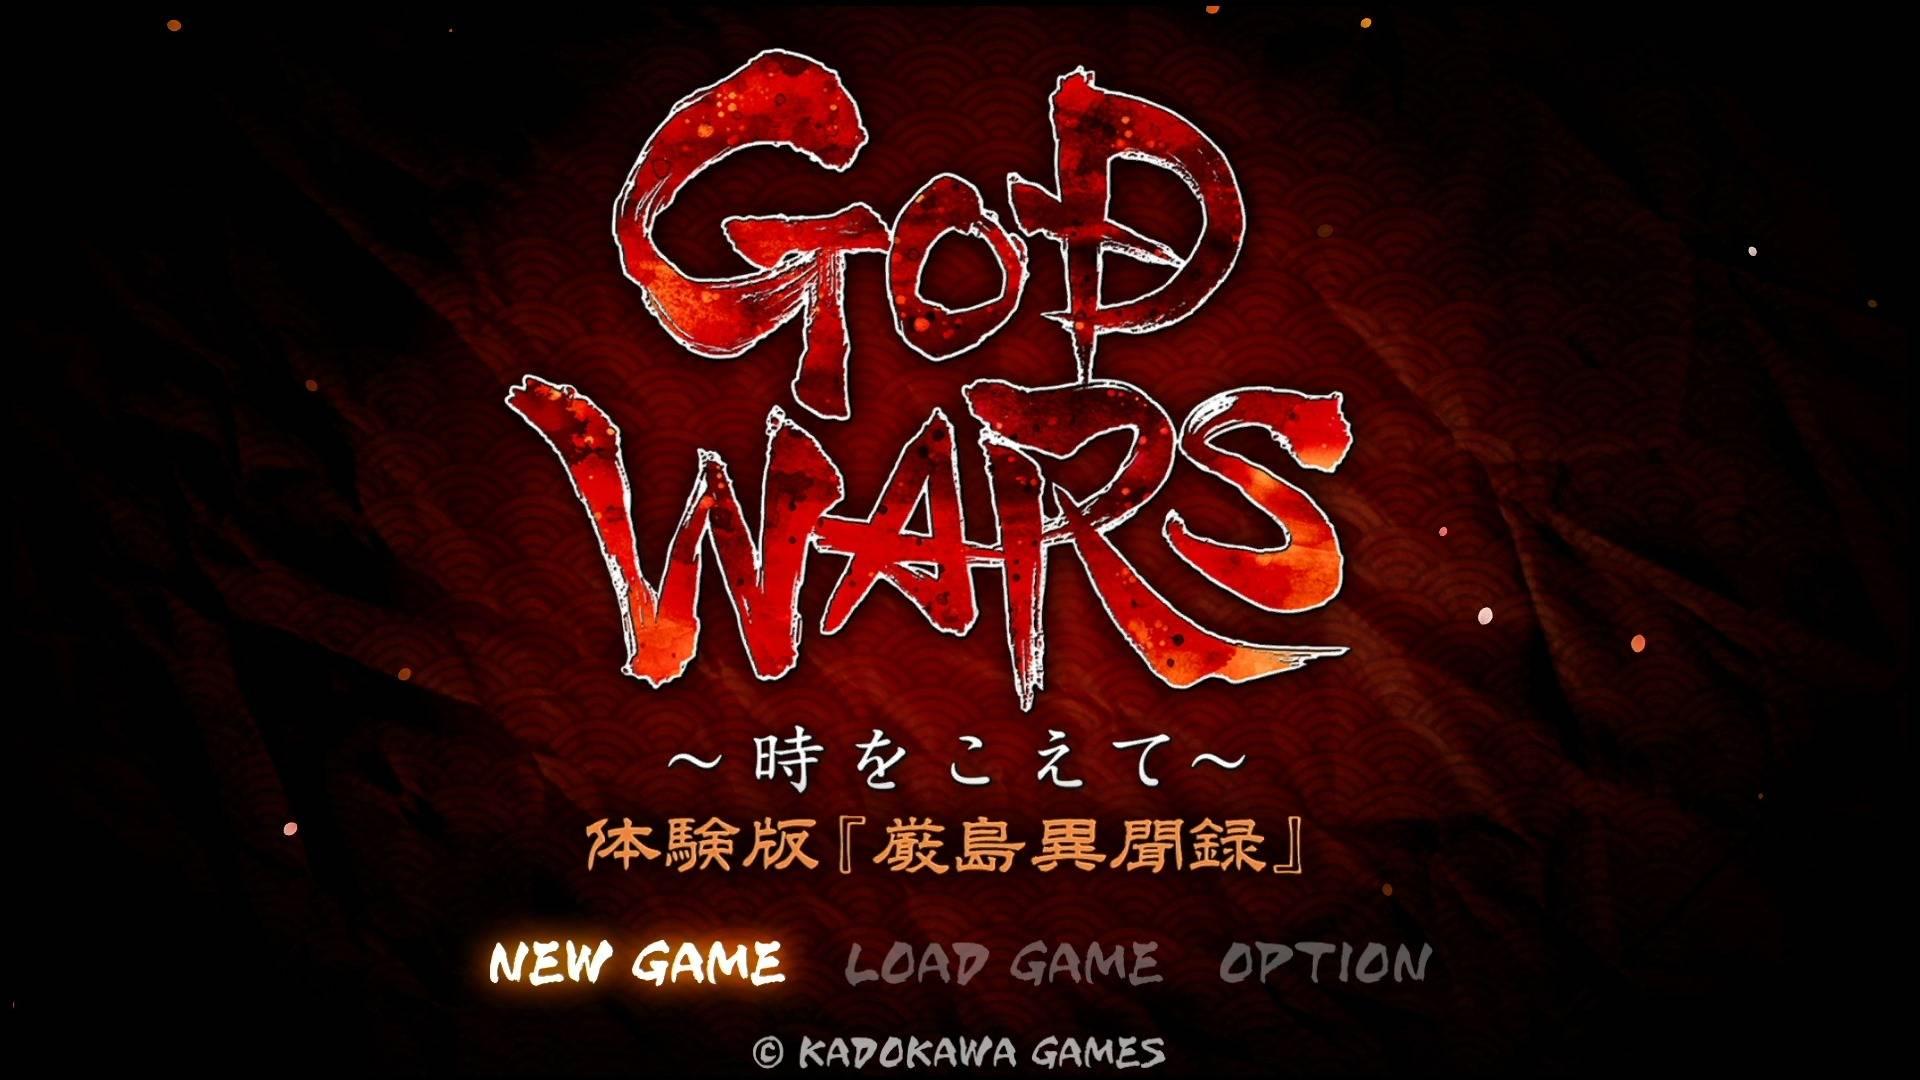 【GOD WARS ~時をこえて~厳島異聞録】「劣化版ディスガイア」「ロード地獄」【プレイレビュー】